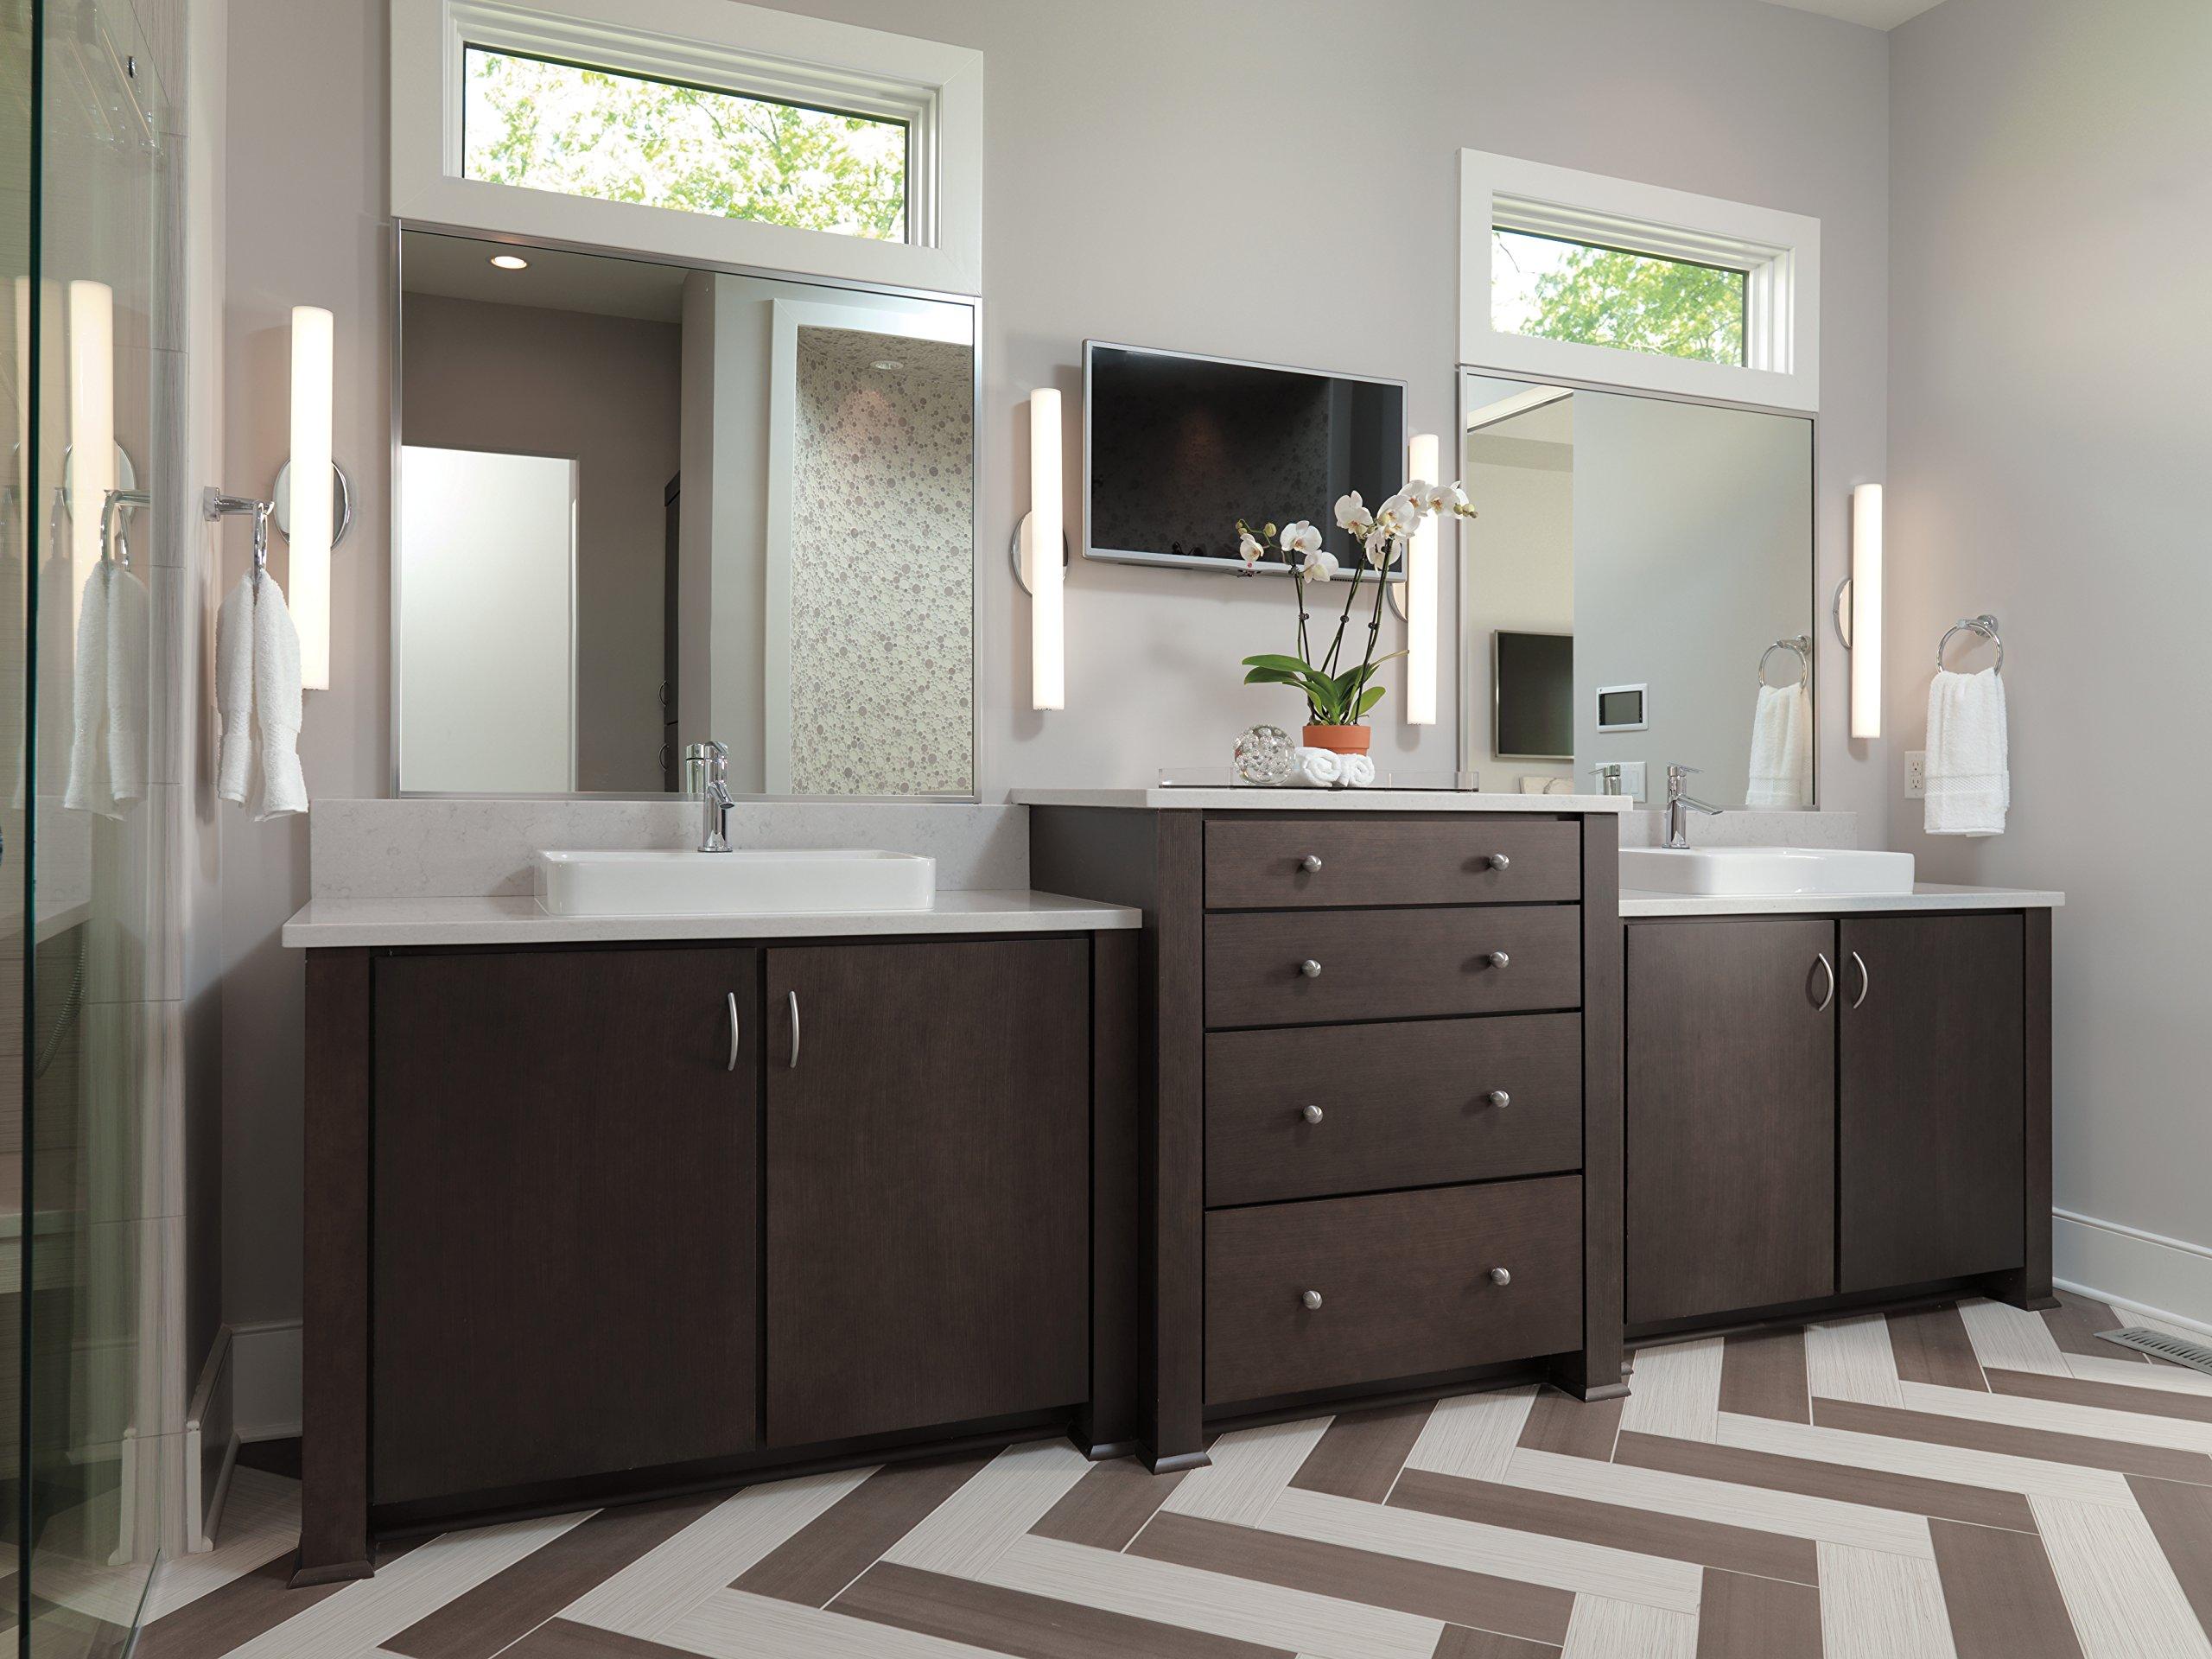 Delta 561-MPU-DST Compel Single Lever Handle Bathroom Faucet with Metal Pop-up Drain, Chrome